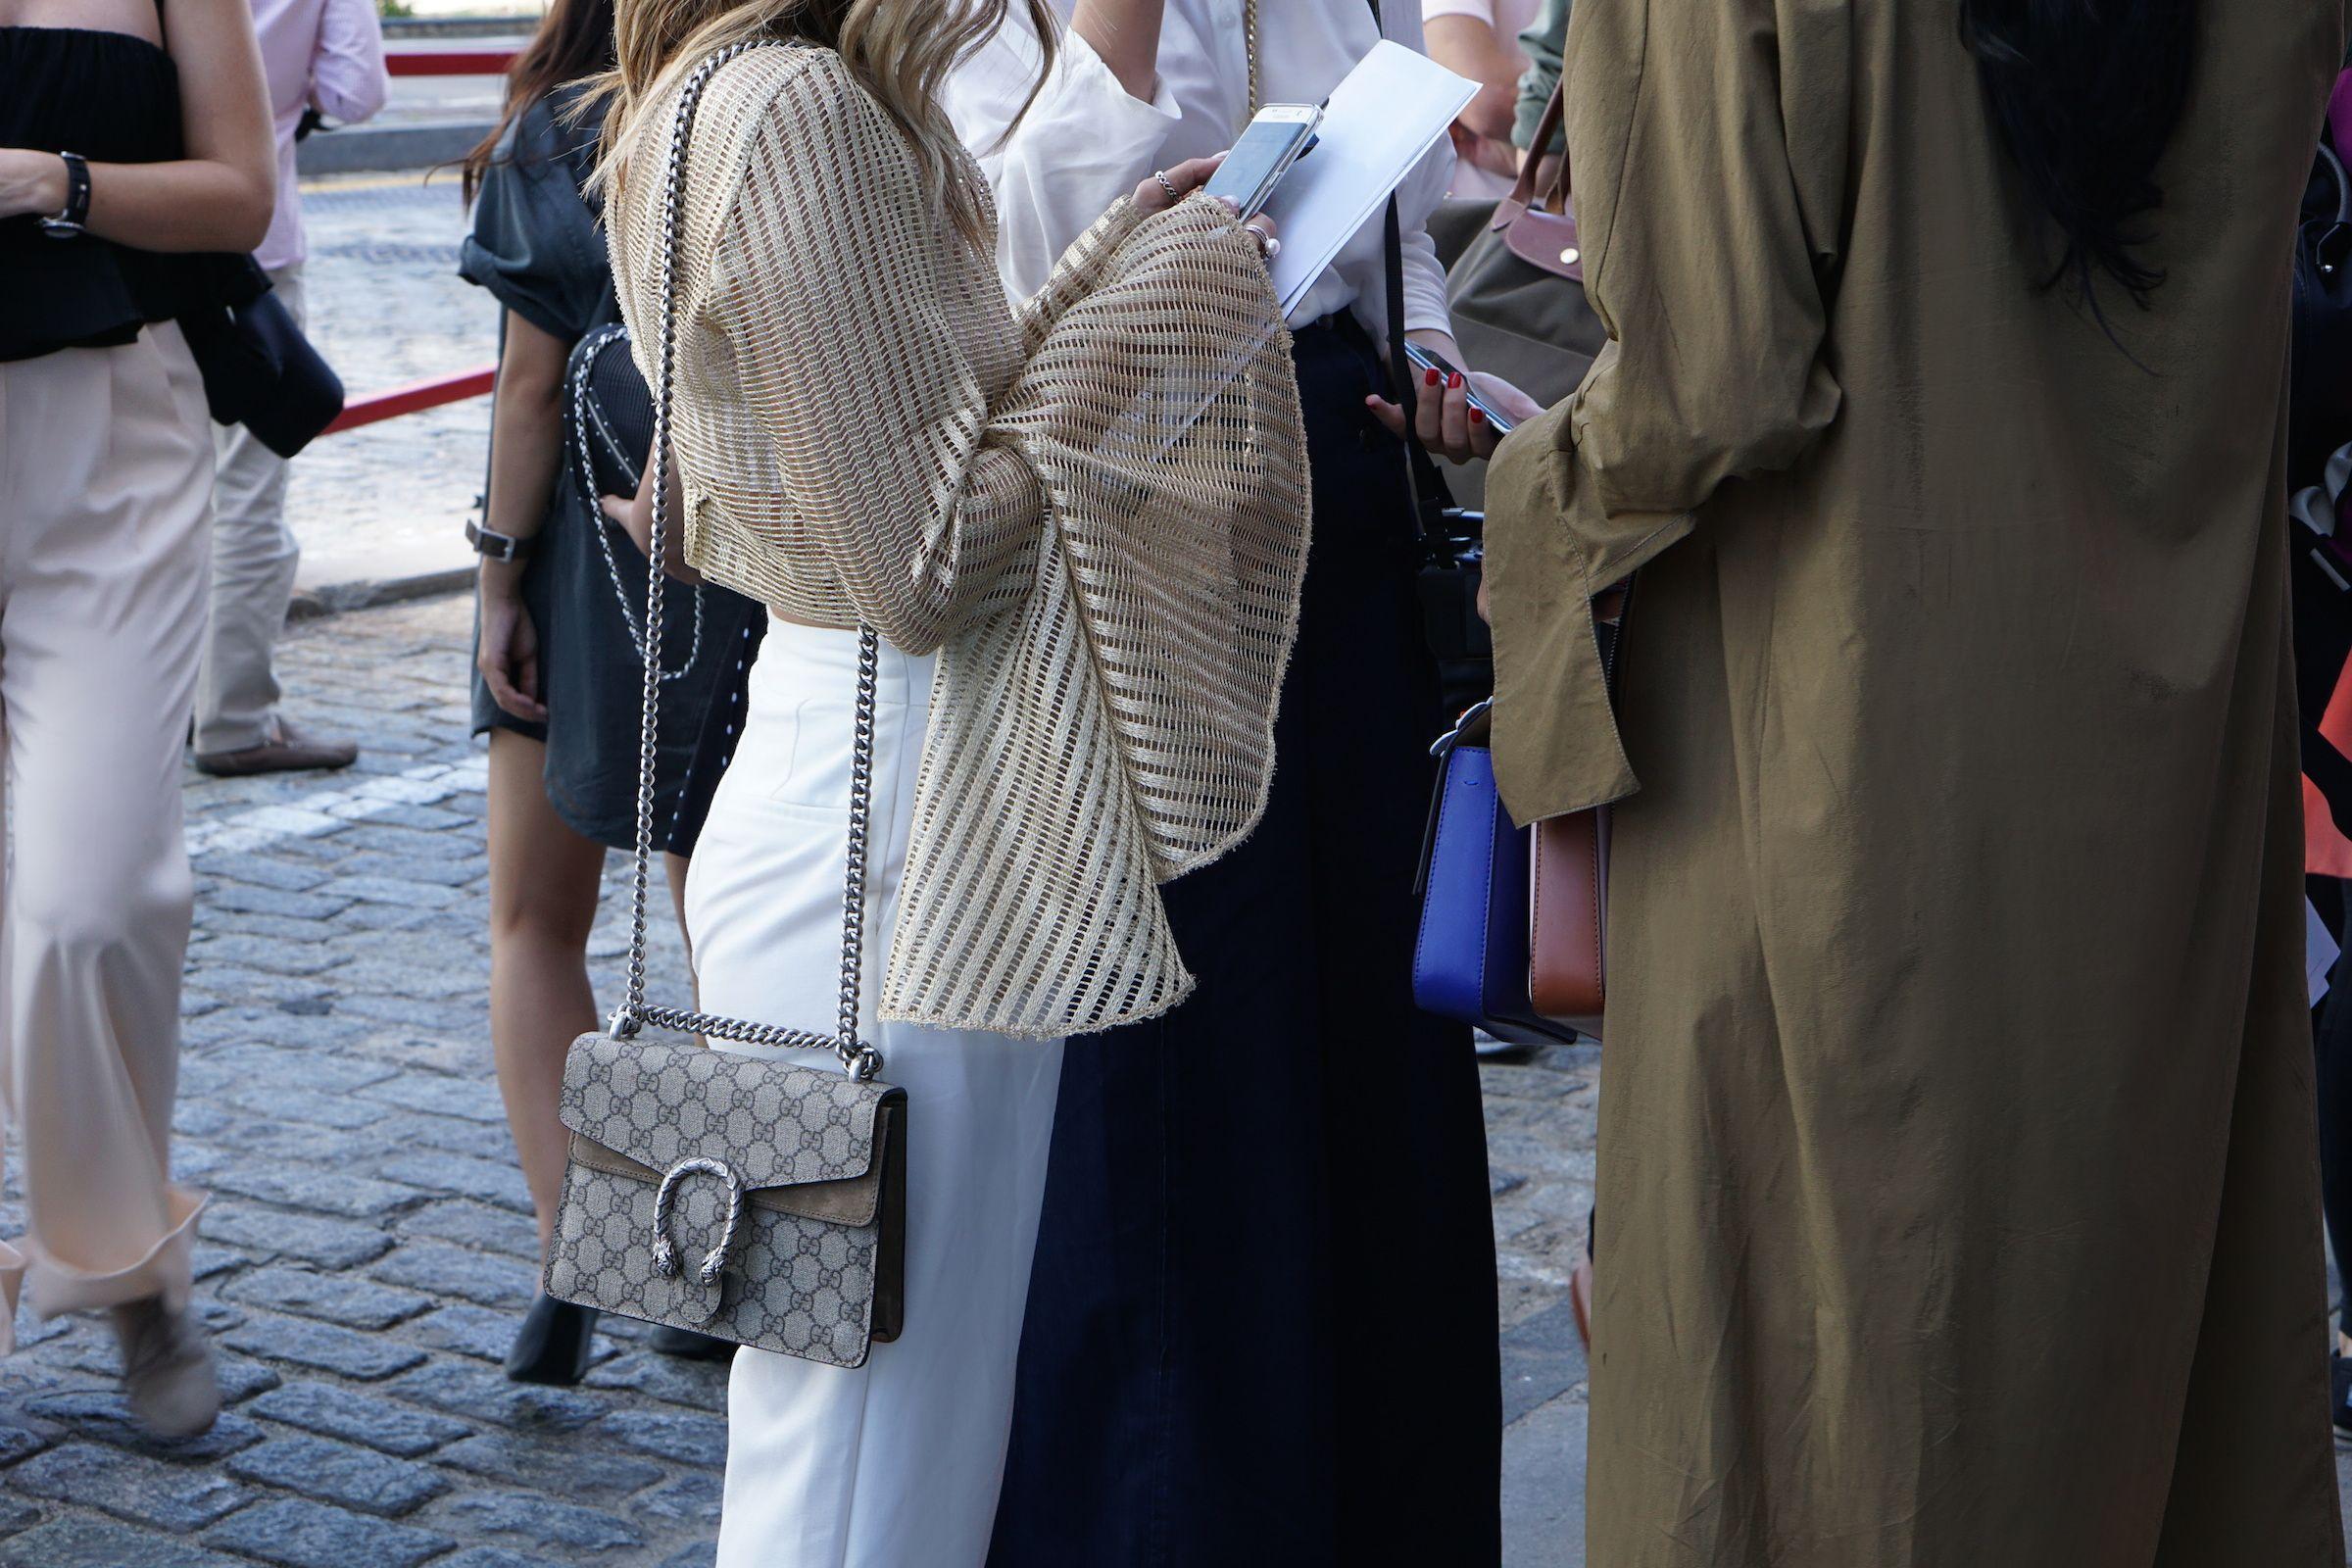 Busy girls at NYFW SS17 #fashion #fashionblogger #NYFW #streetstyle #gucci #bag #parka #girls #crowd #NYC